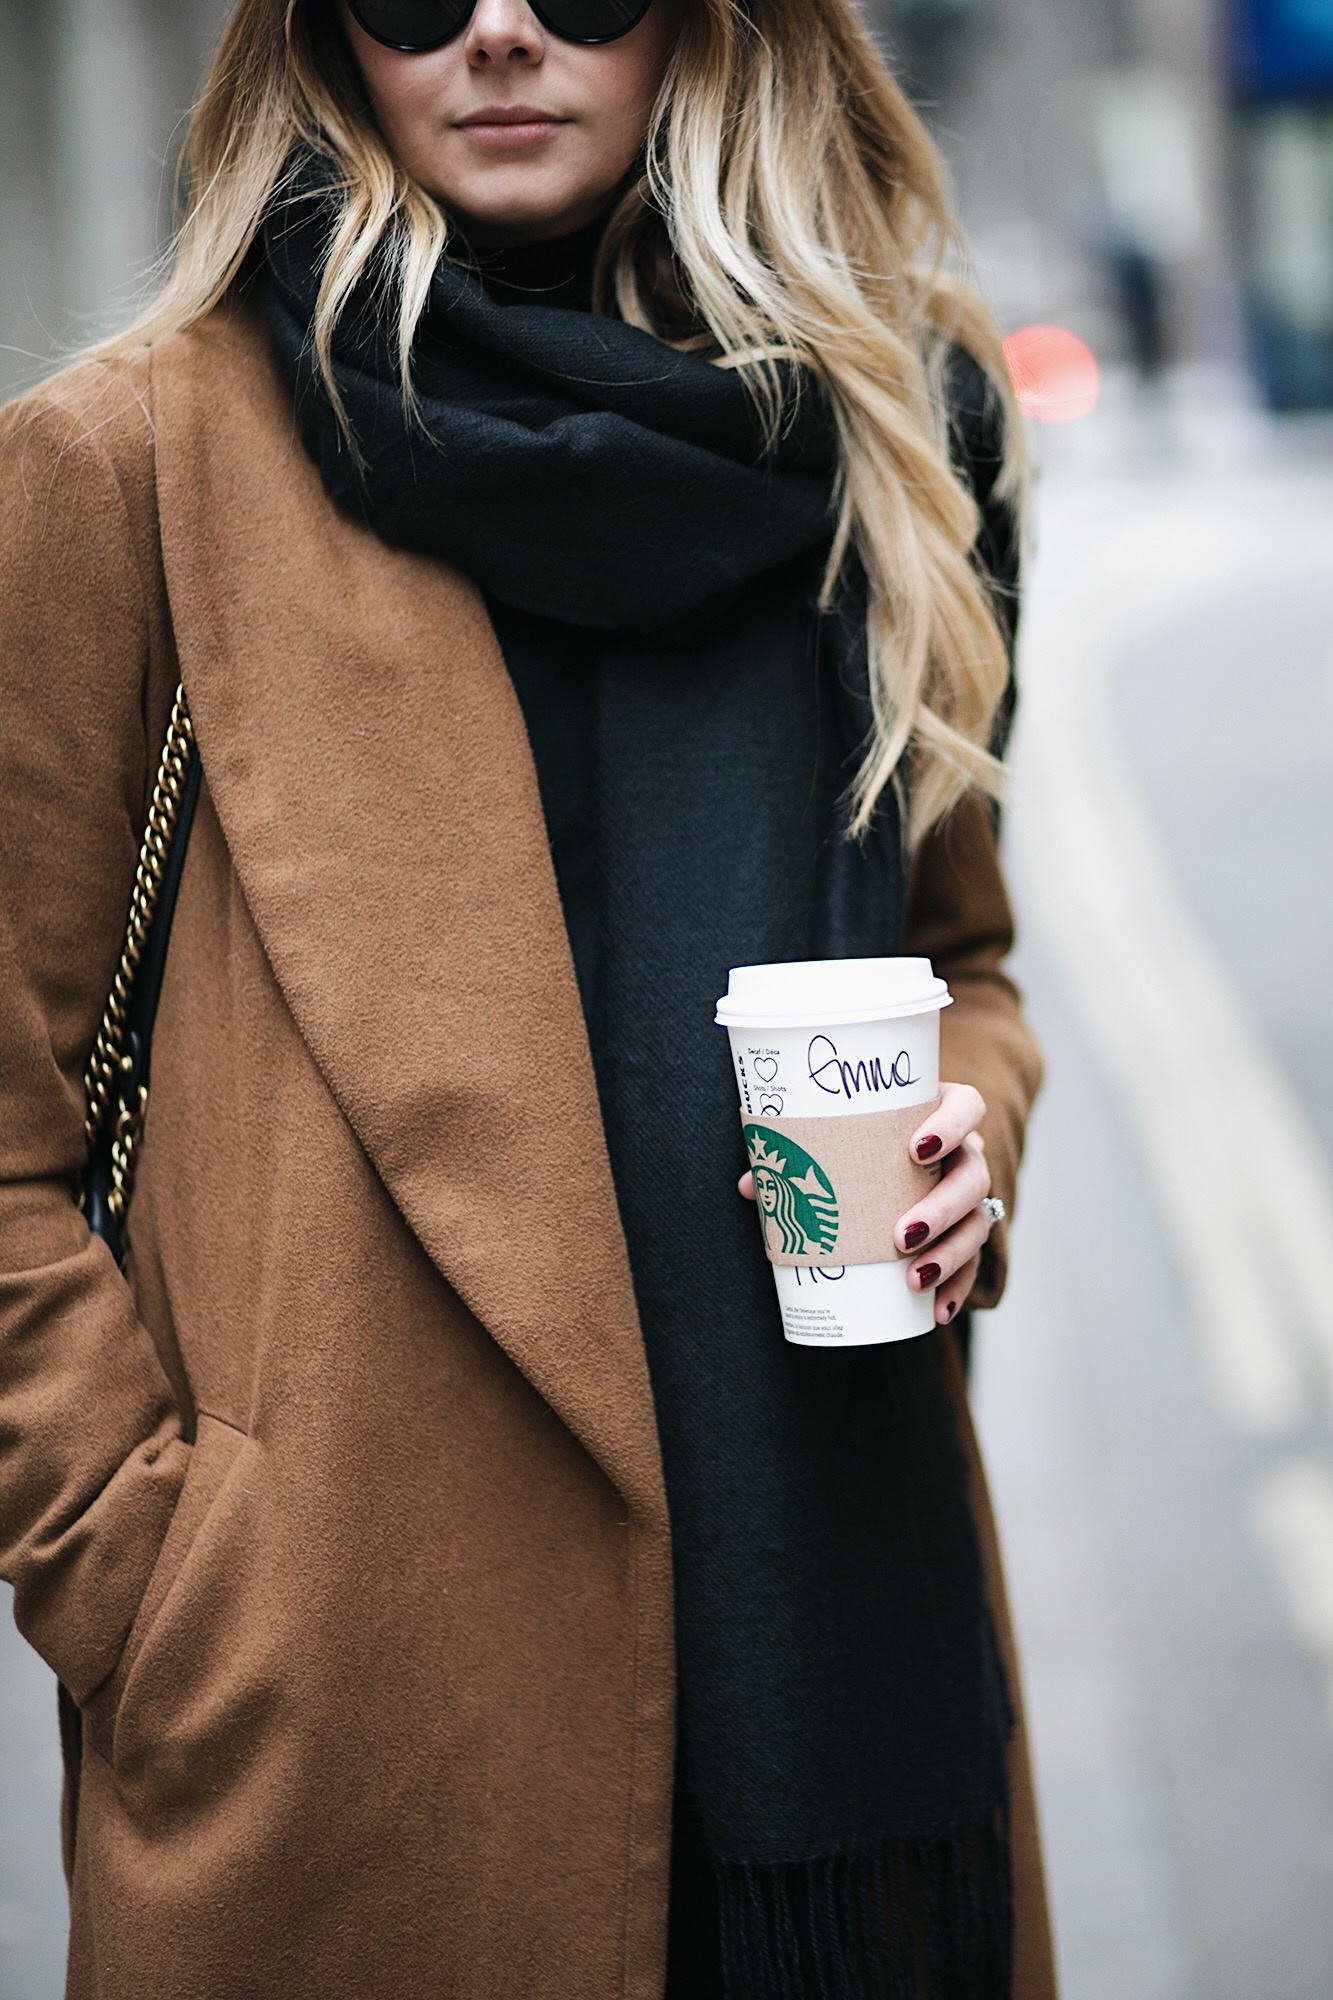 EJ STYLE - Camel coat, black scarf